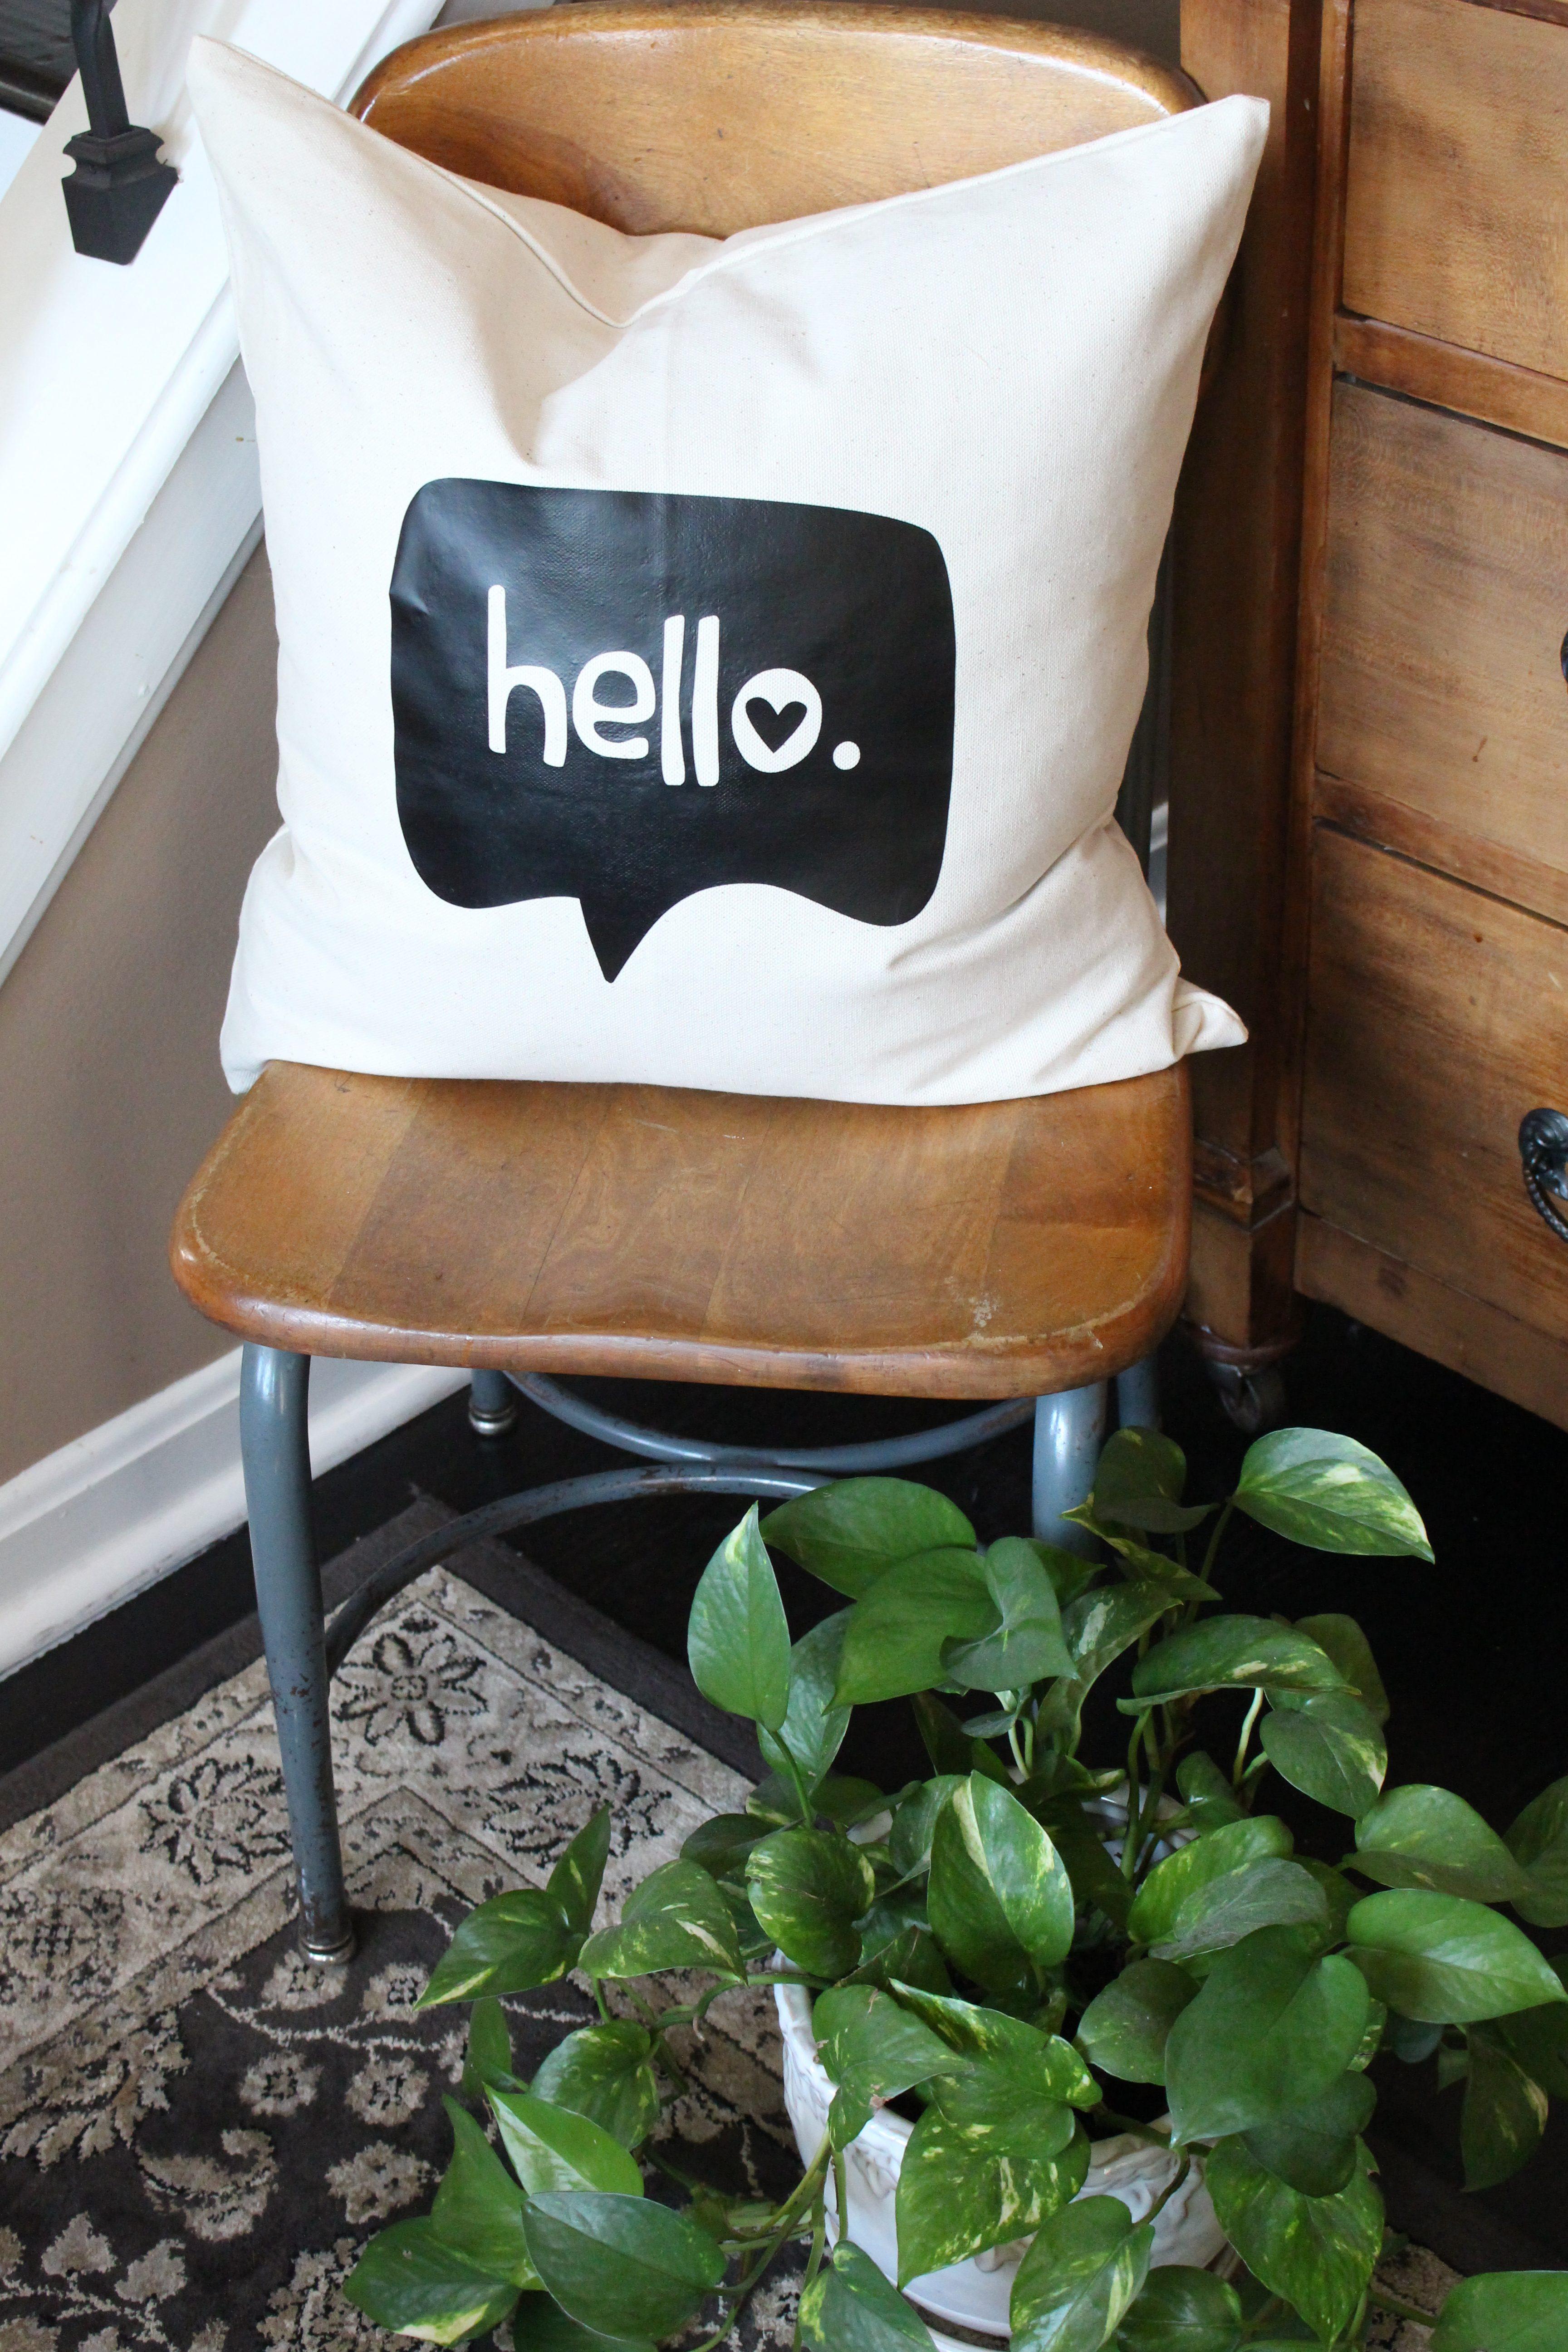 Silhouette Cameo Vinyl Heat Transfer Pillow Cover project | Silhouette projects | Silhouette Cameo | vinyl | DIY pillow cover | decor | pillows